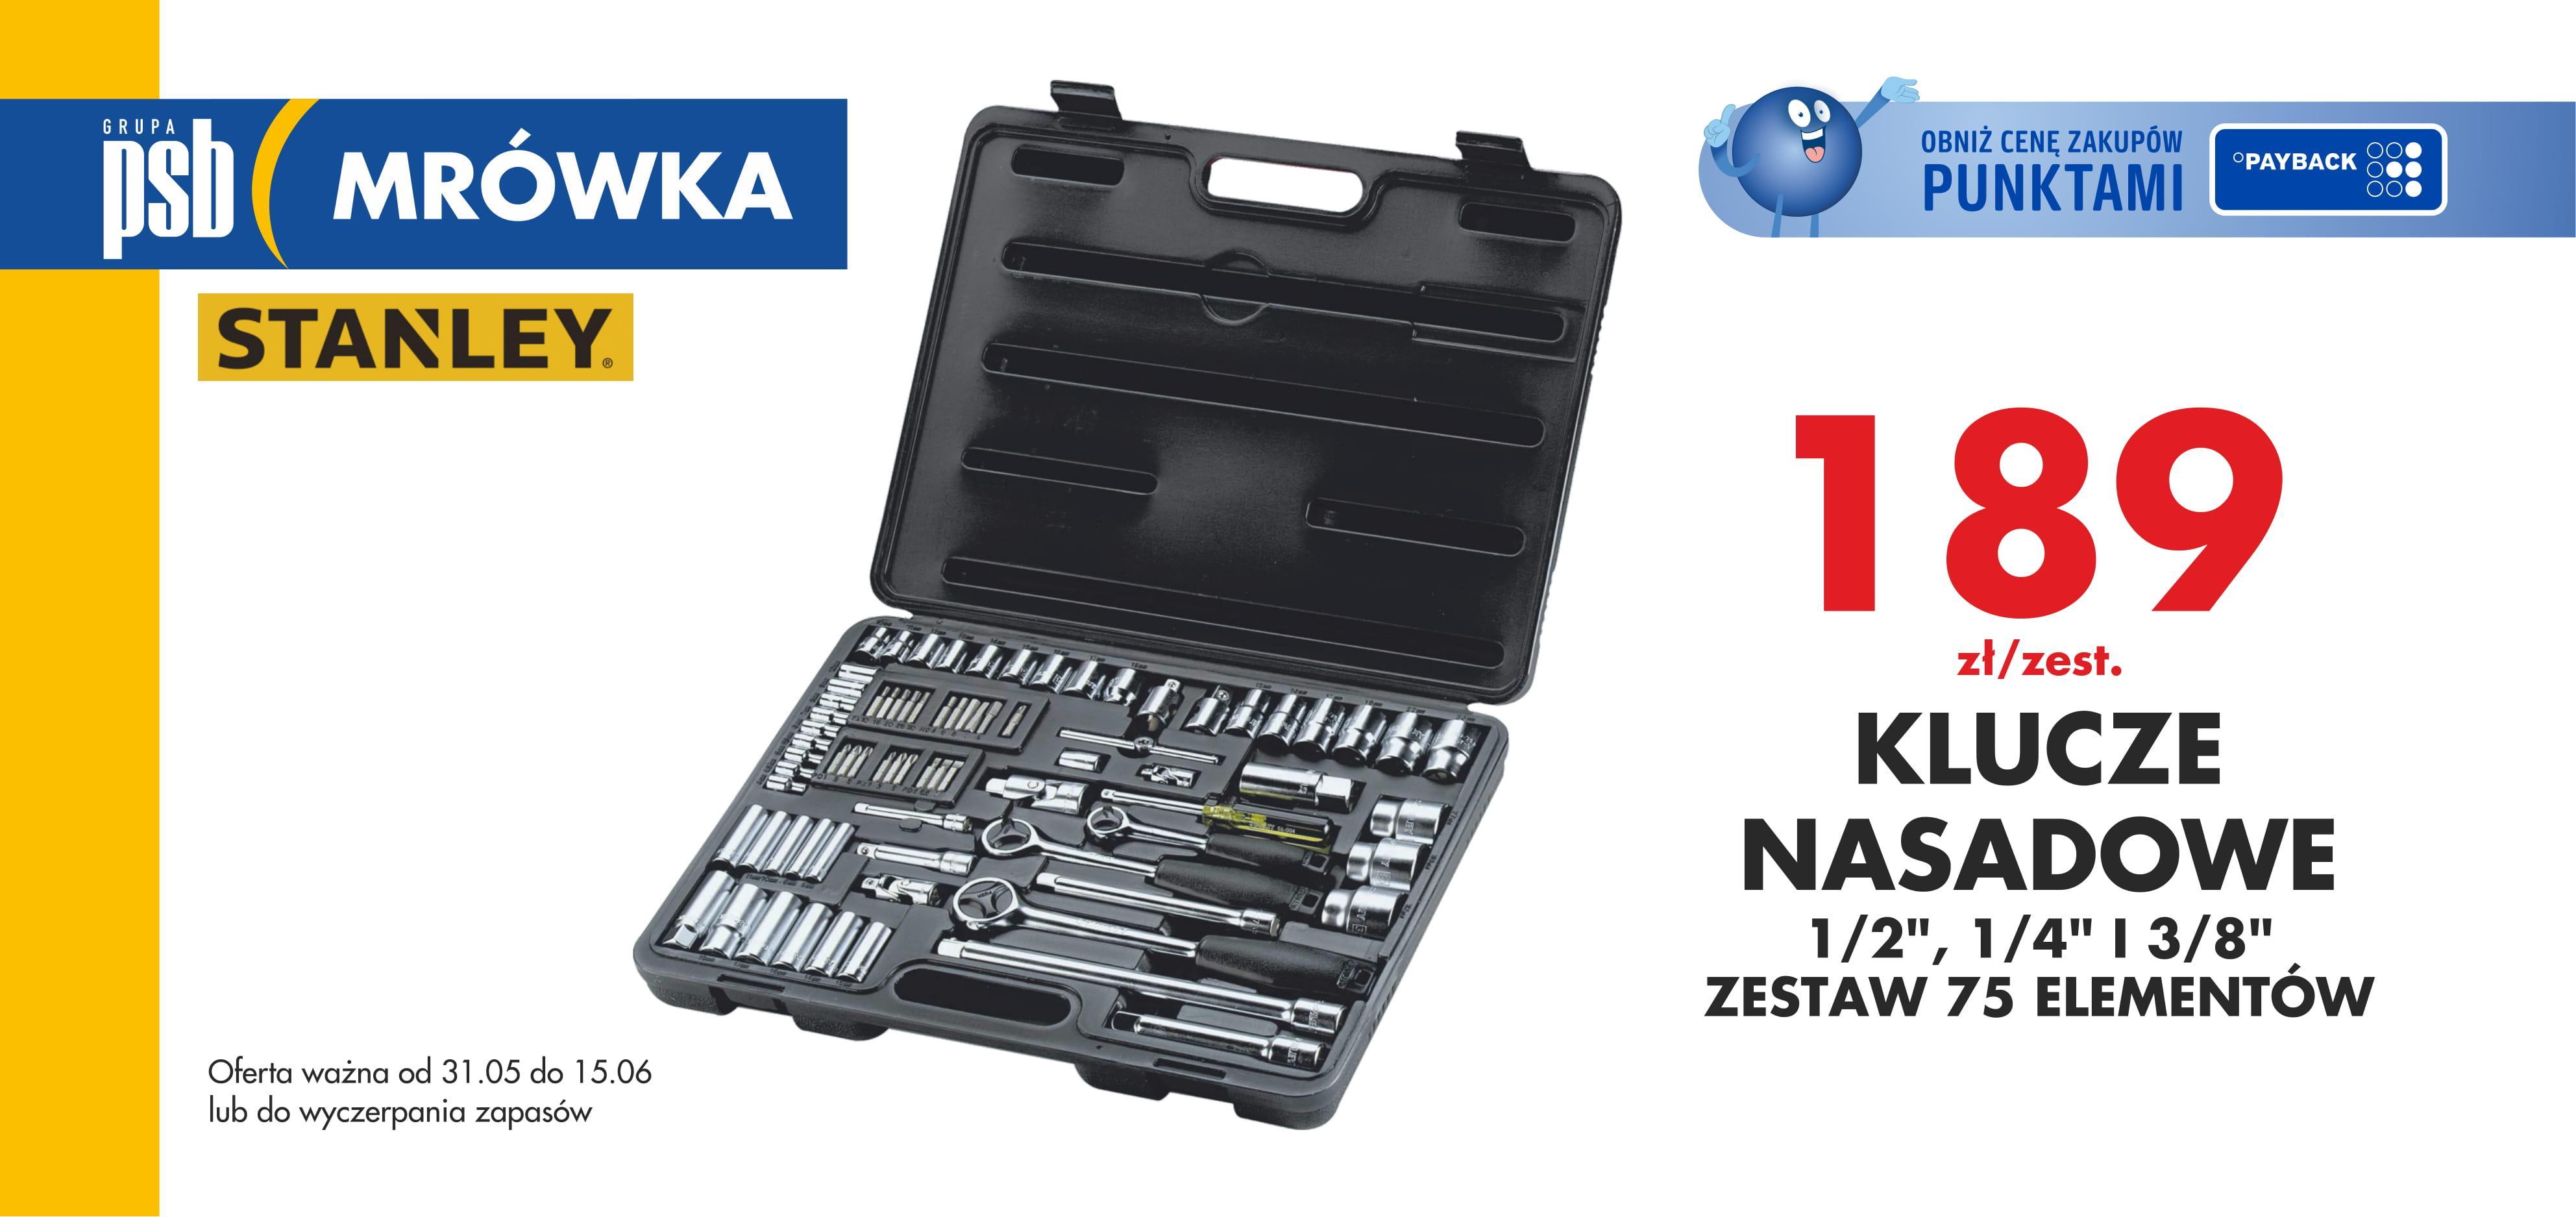 Klucze-nasadowe-504x238-1